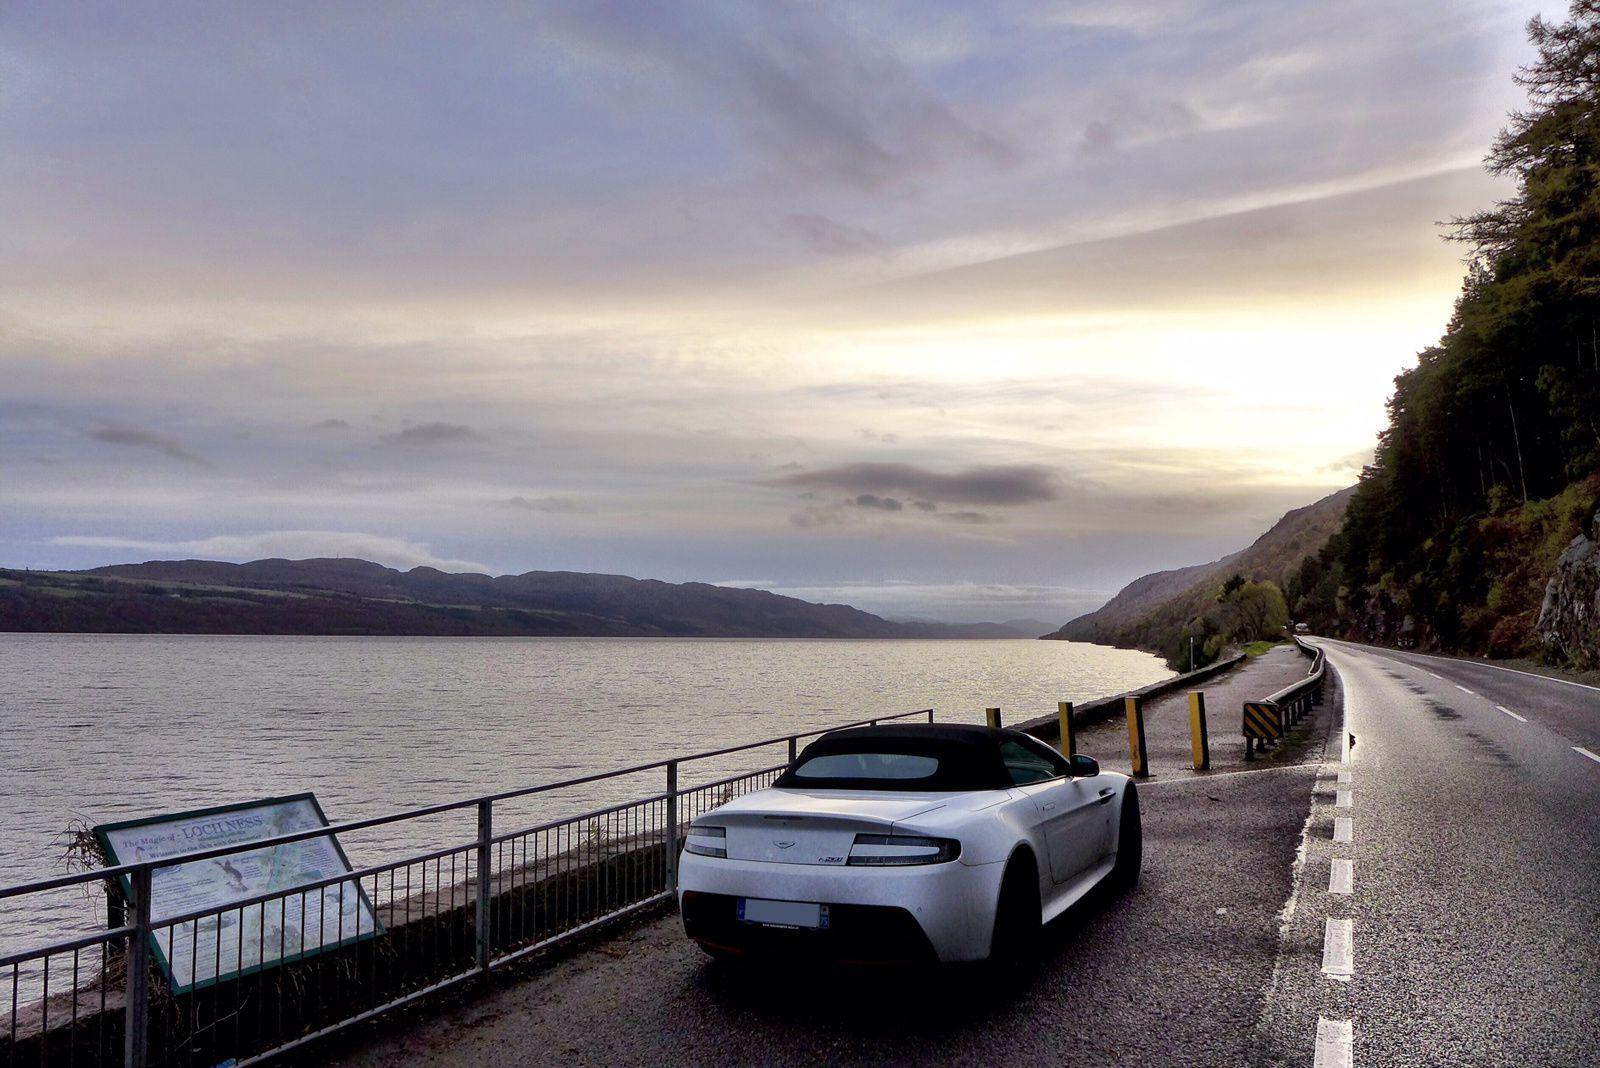 Road trip d'un Membre AMOC France sur les terres d'Aston Martin !